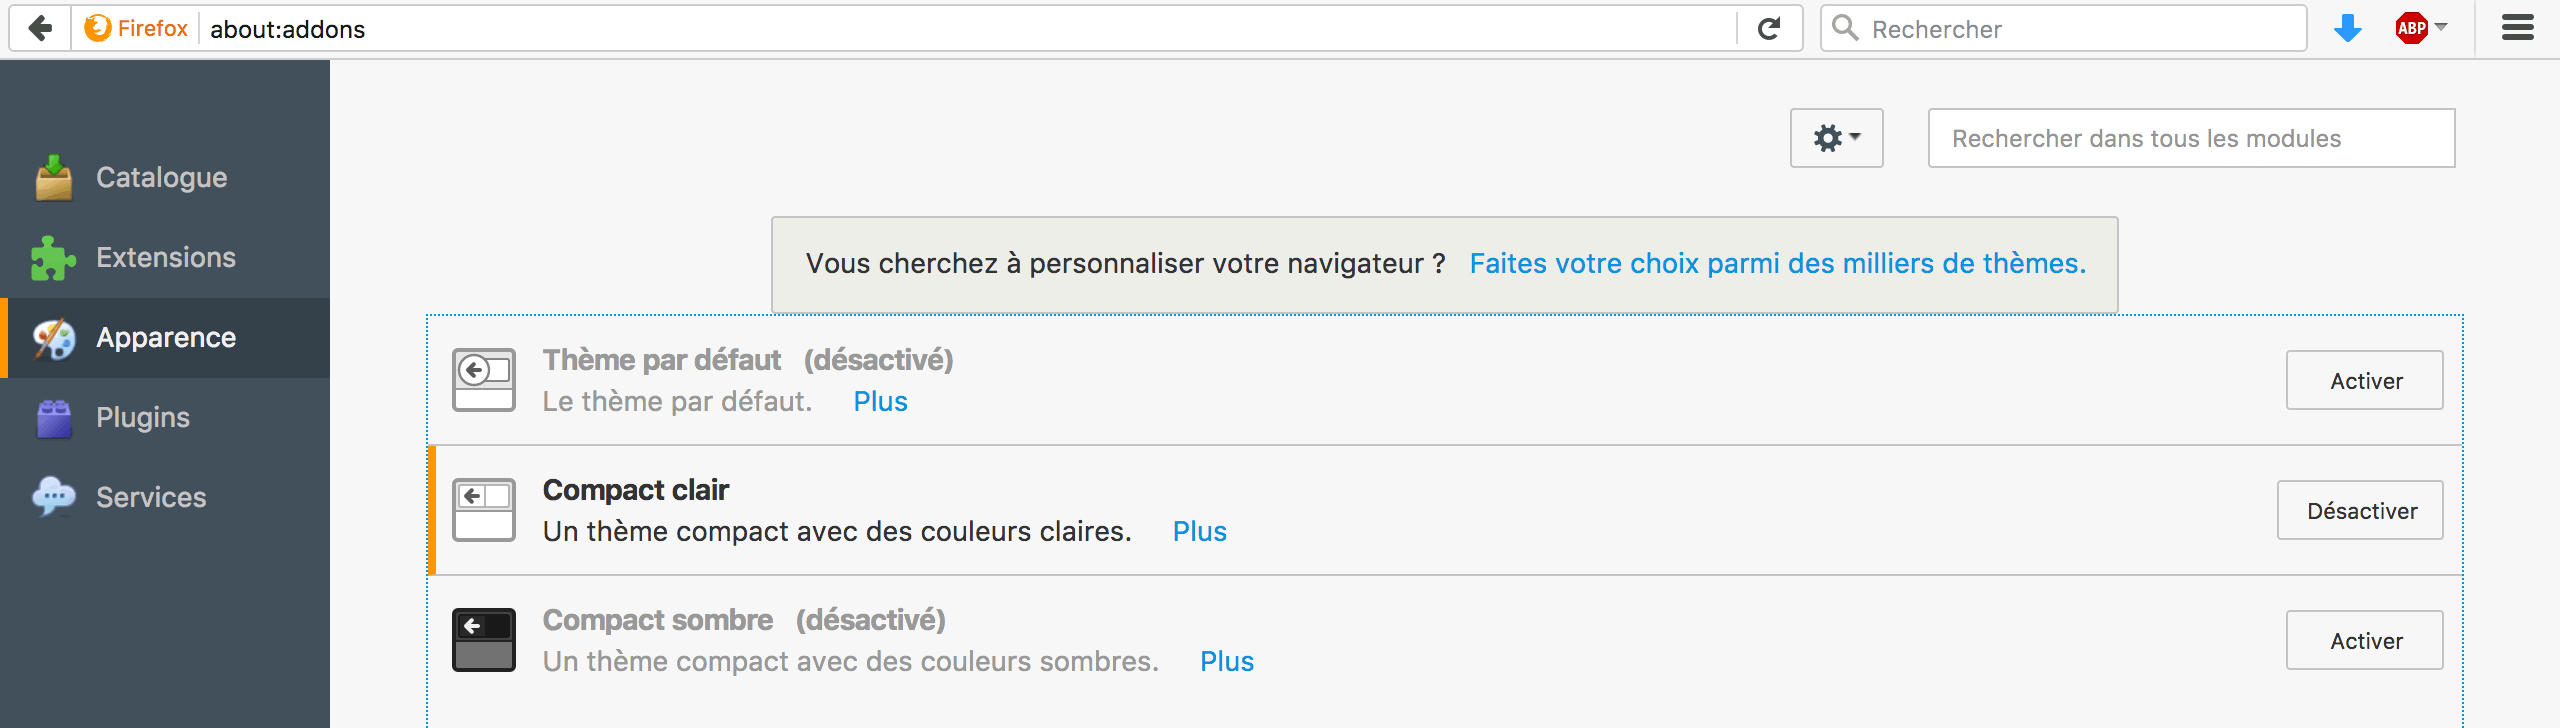 Capture d'écran - Apparence, Firefox